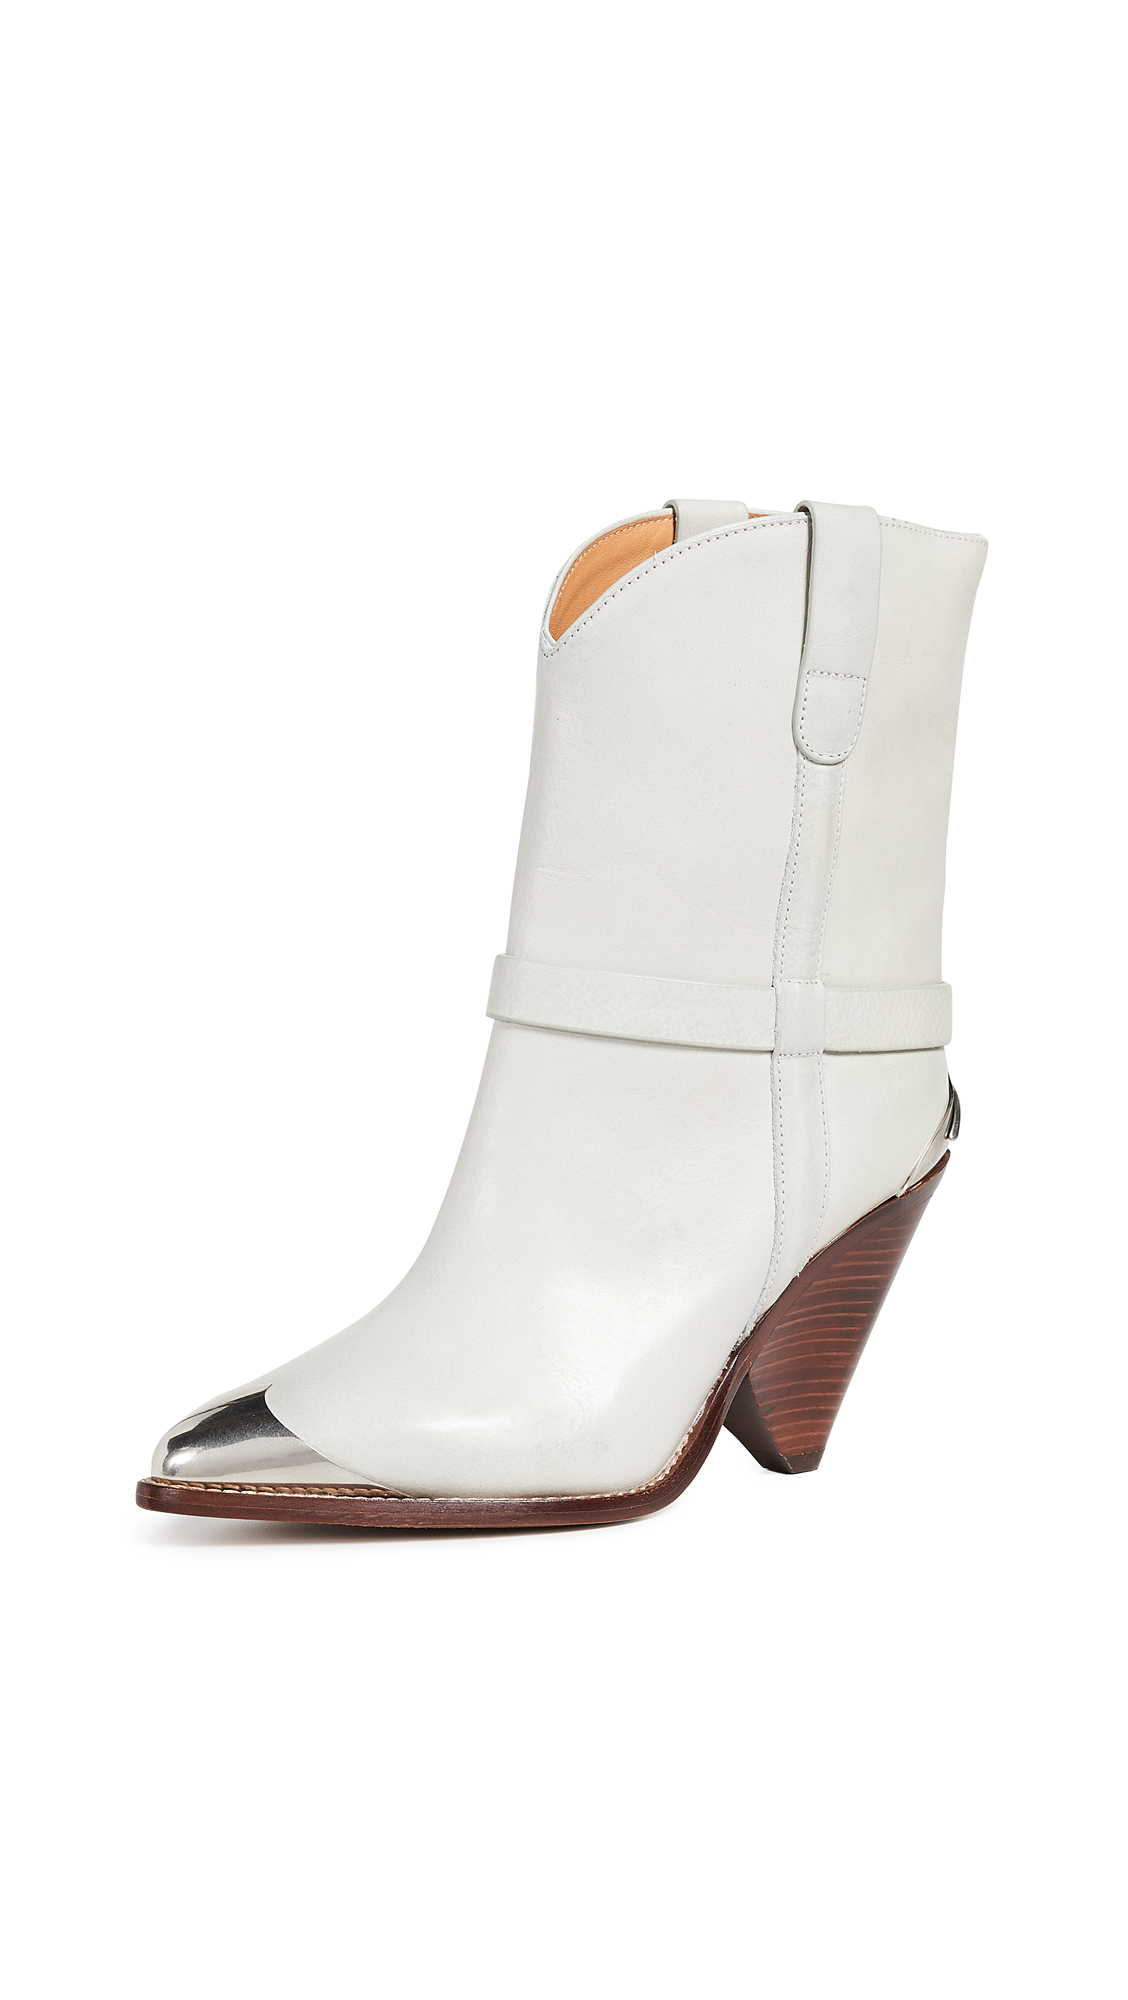 Isabel Marant Lamsy Boots - Chalk